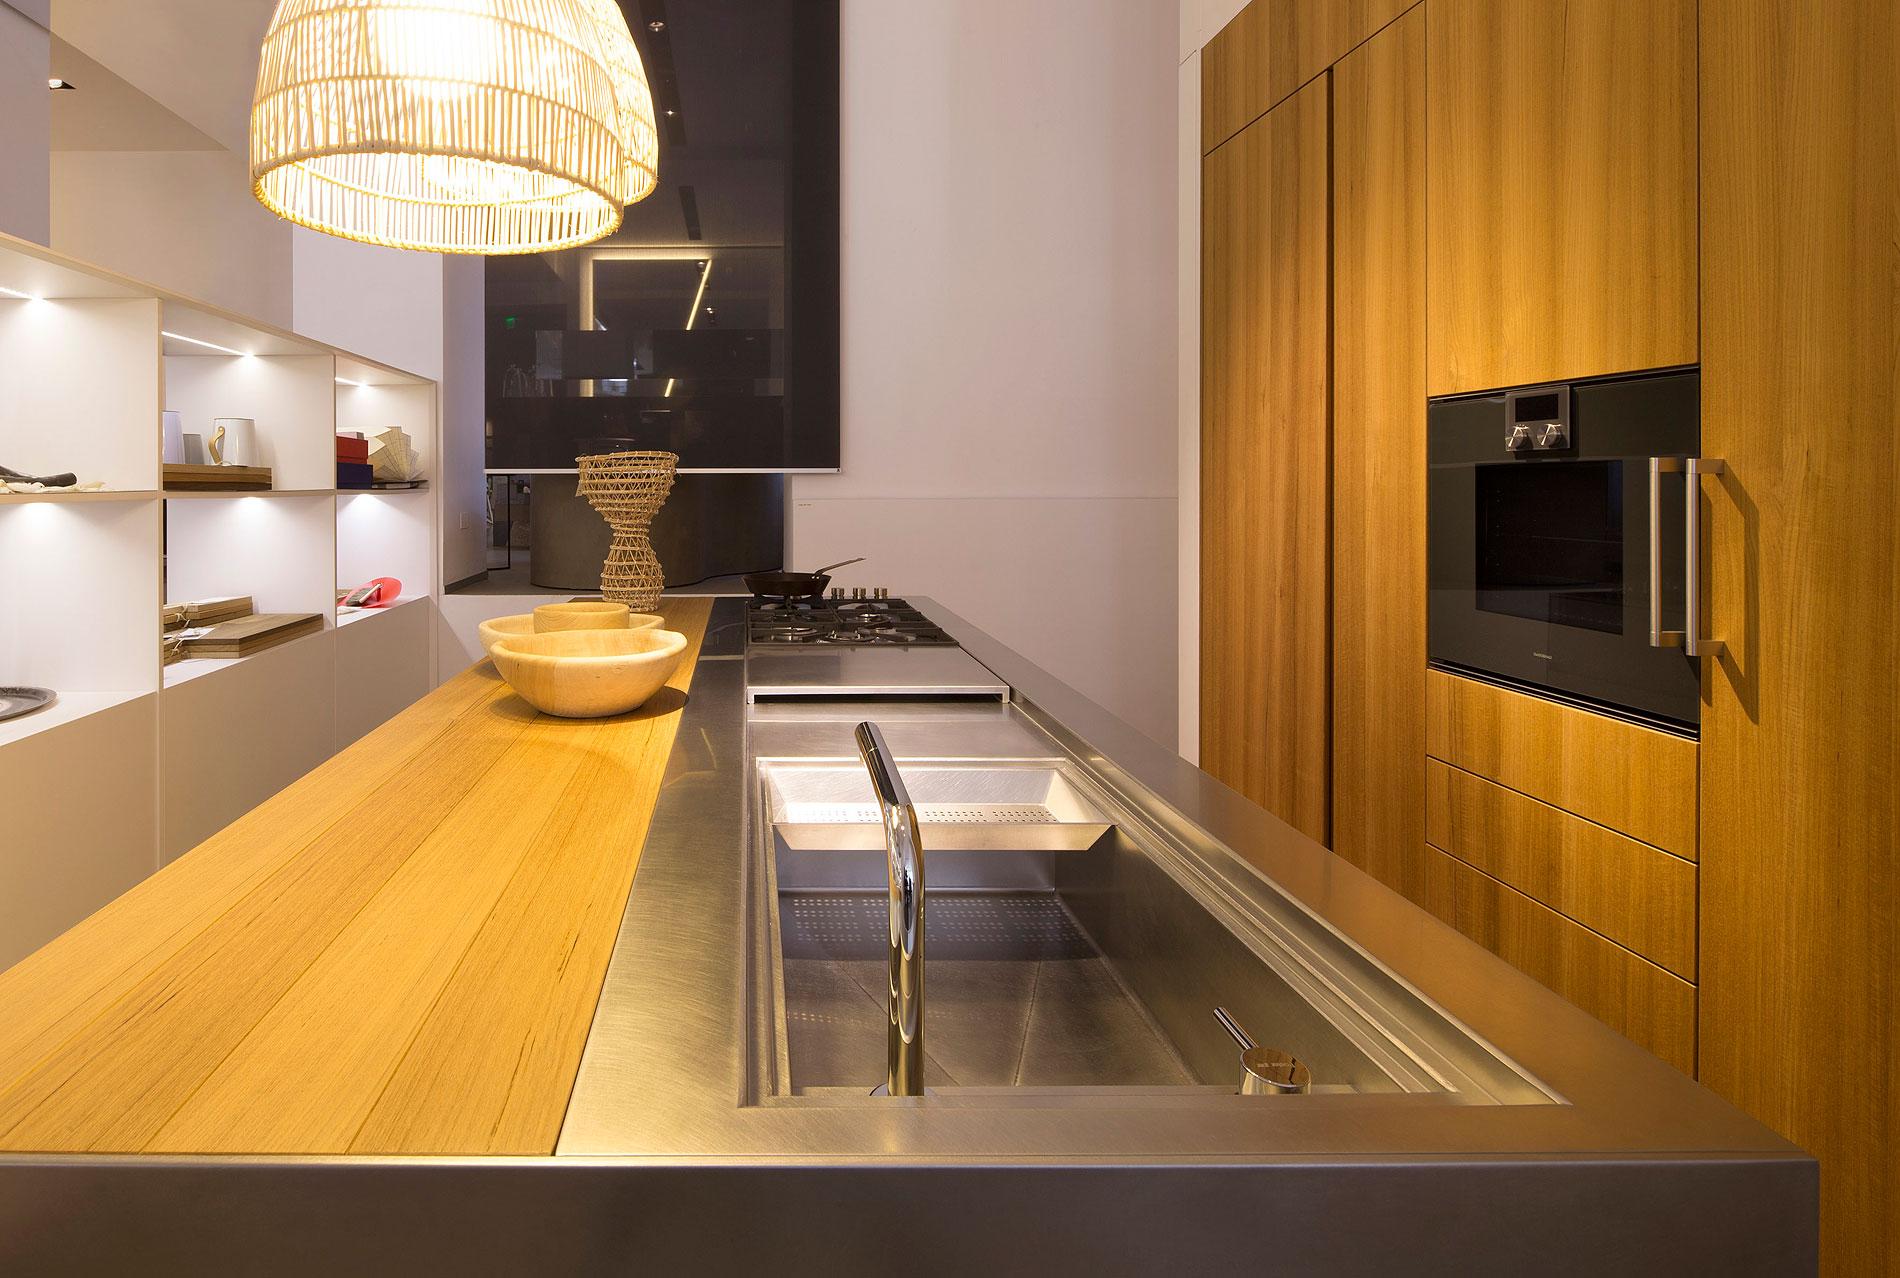 Previa mil n 2016 cocina basik de key cucine for Cucine design 2016